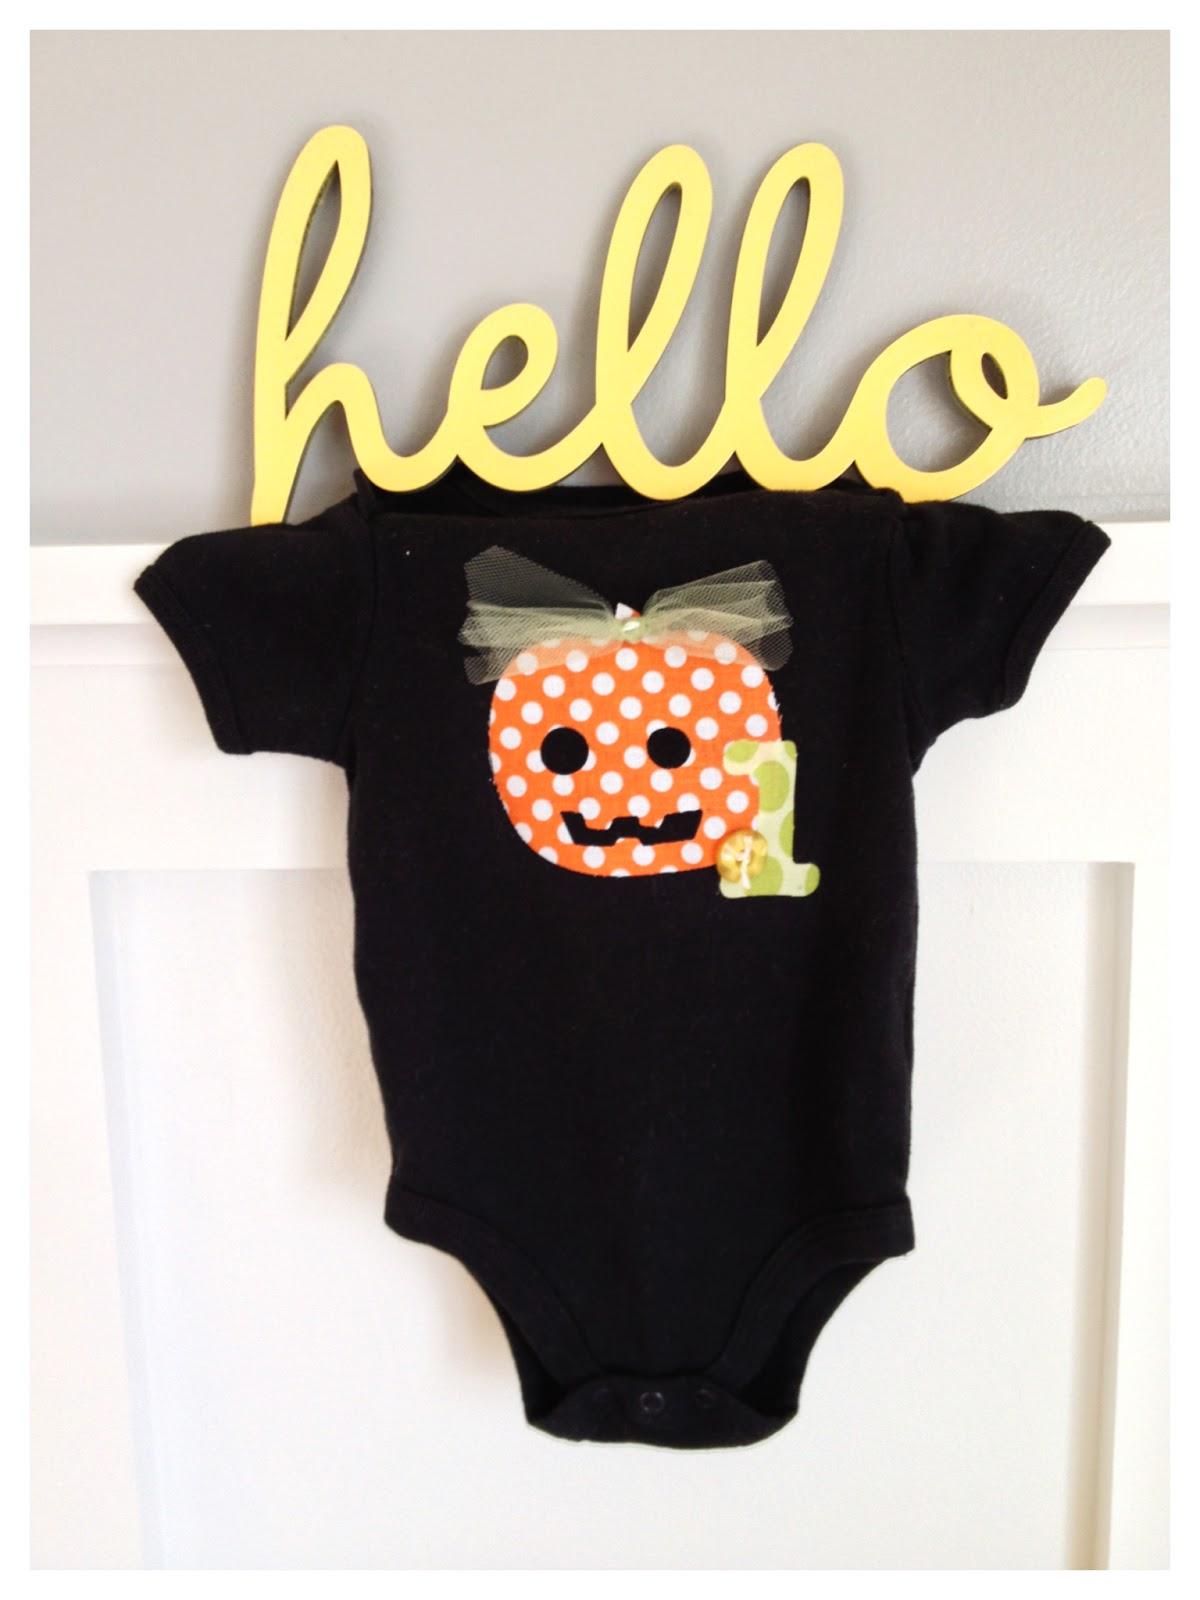 http://2.bp.blogspot.com/-Oa9q0TNl6VY/UKEmZDOlN1I/AAAAAAAAC5I/TsPCyhTzo-s/s1600/Halloween13_pumponesies.jpg